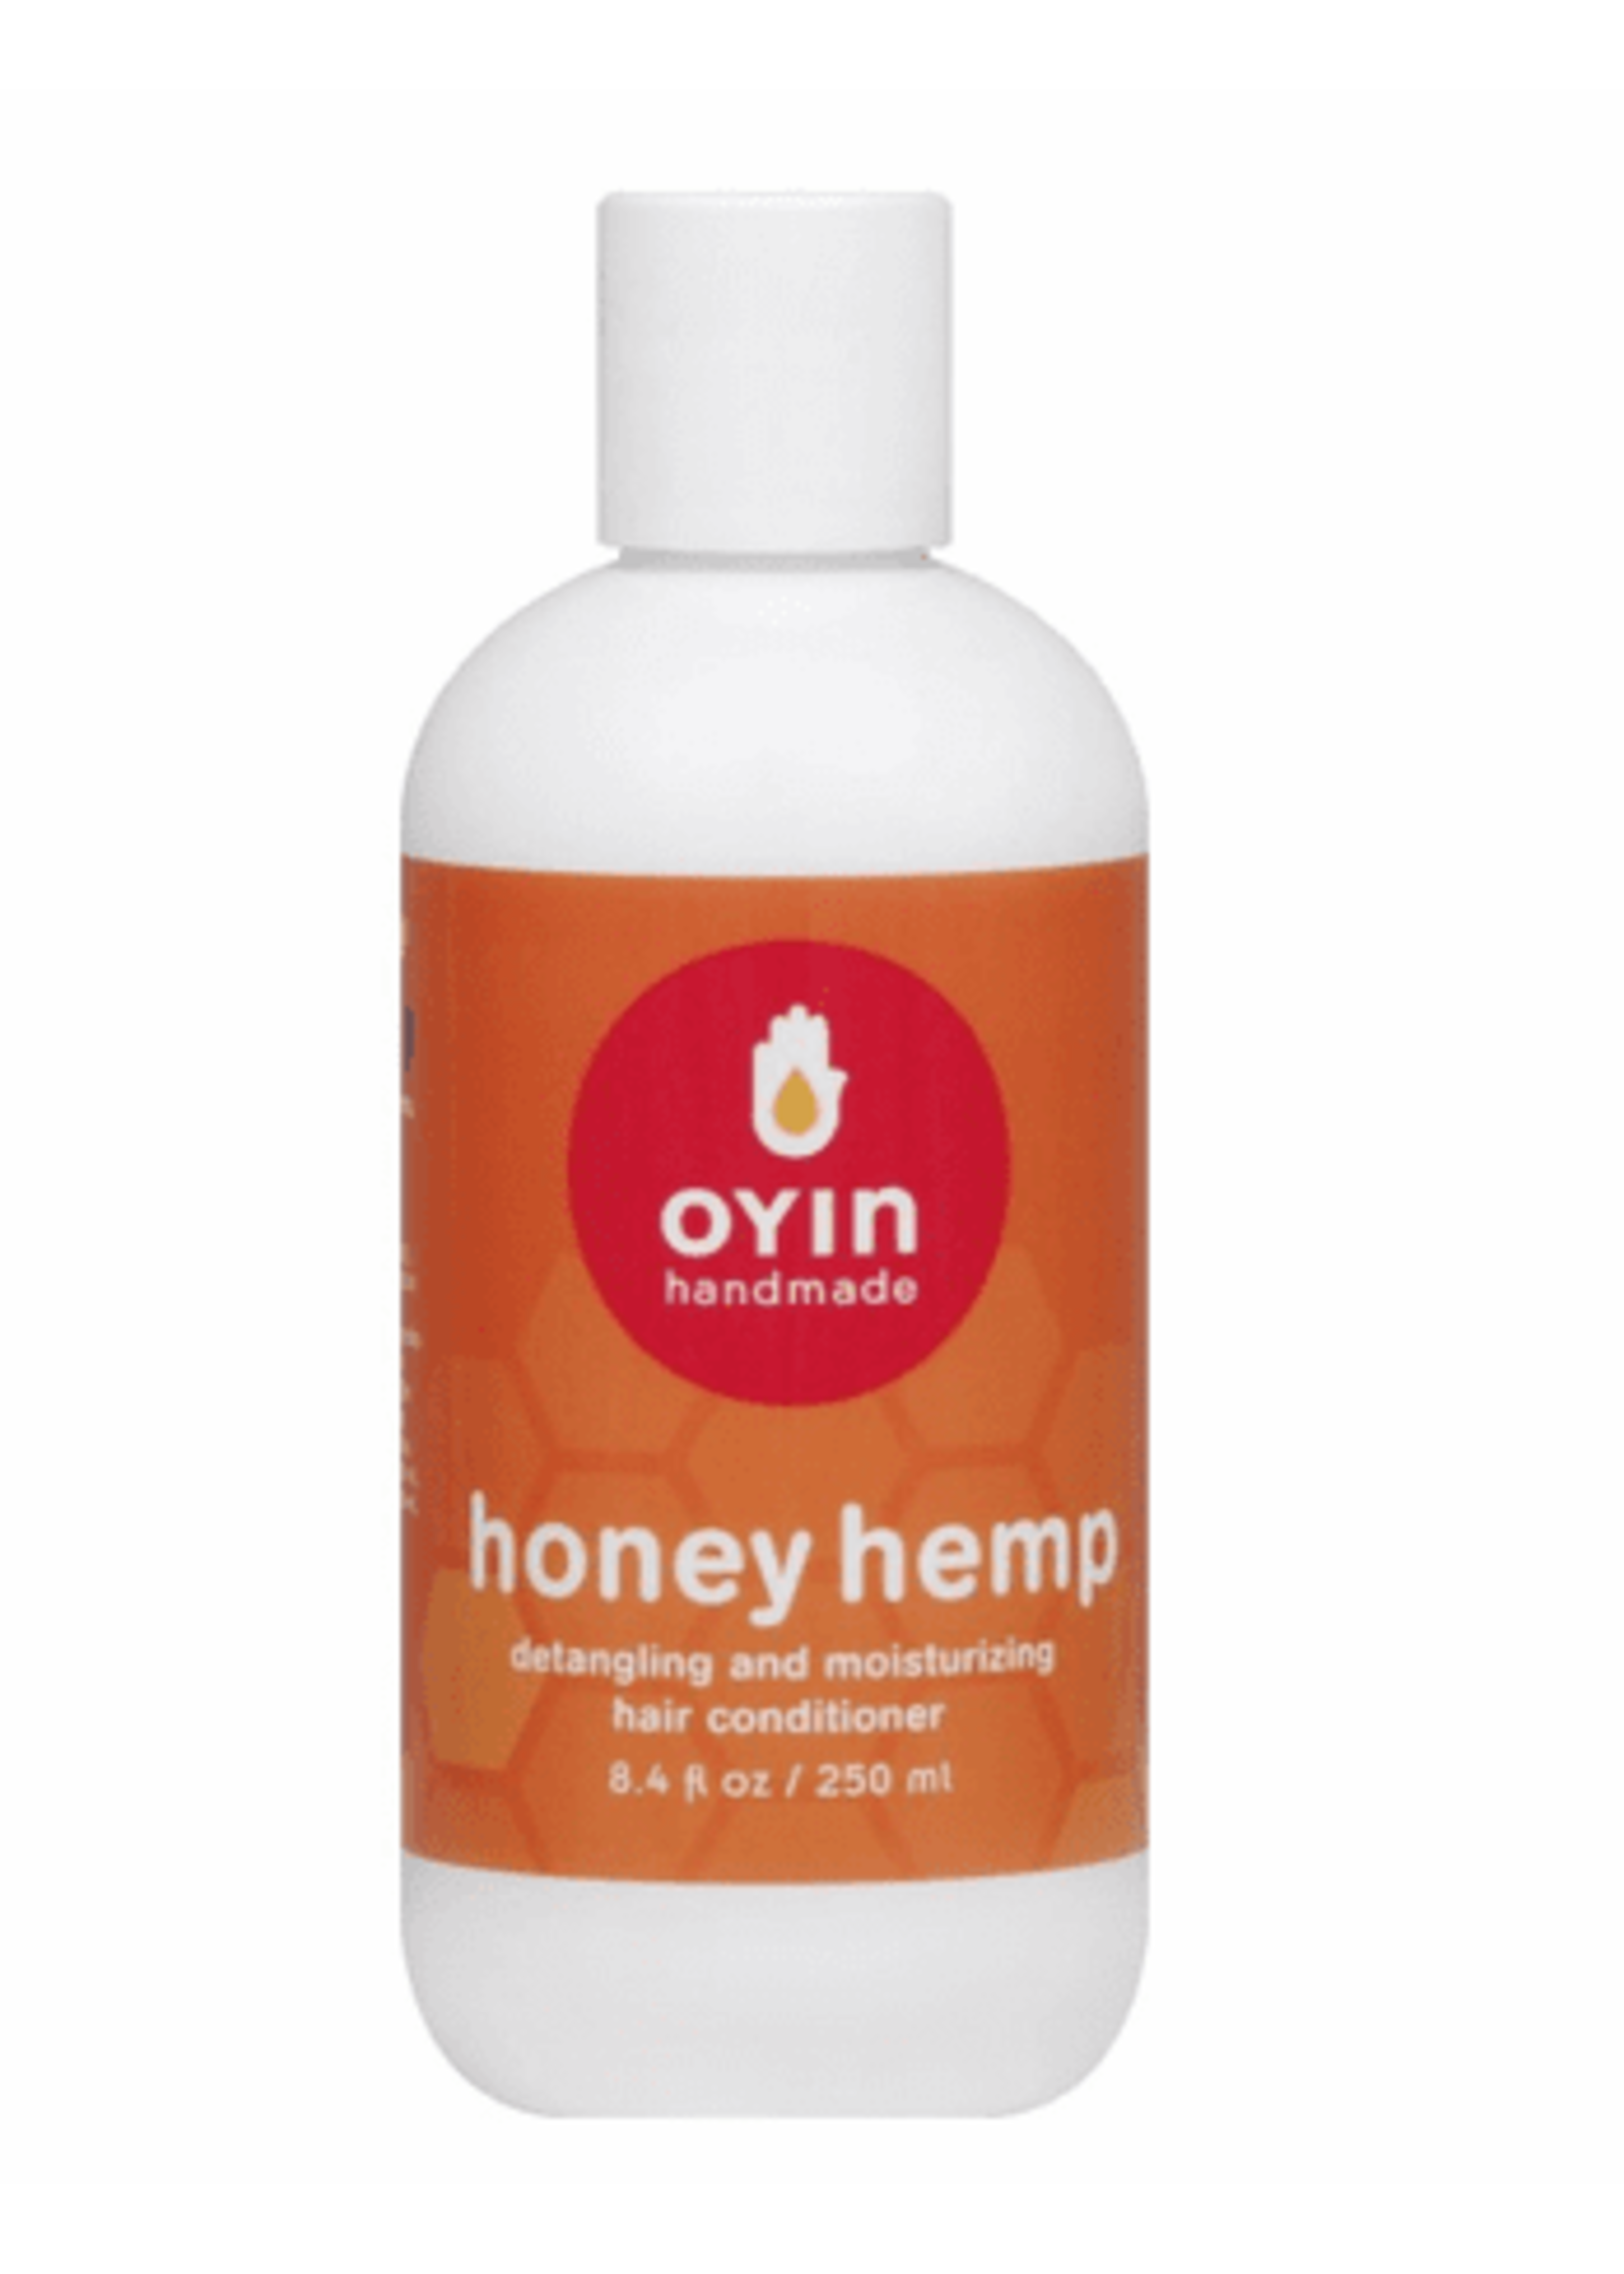 Oyin Honey Hemp Cond 8.4oz